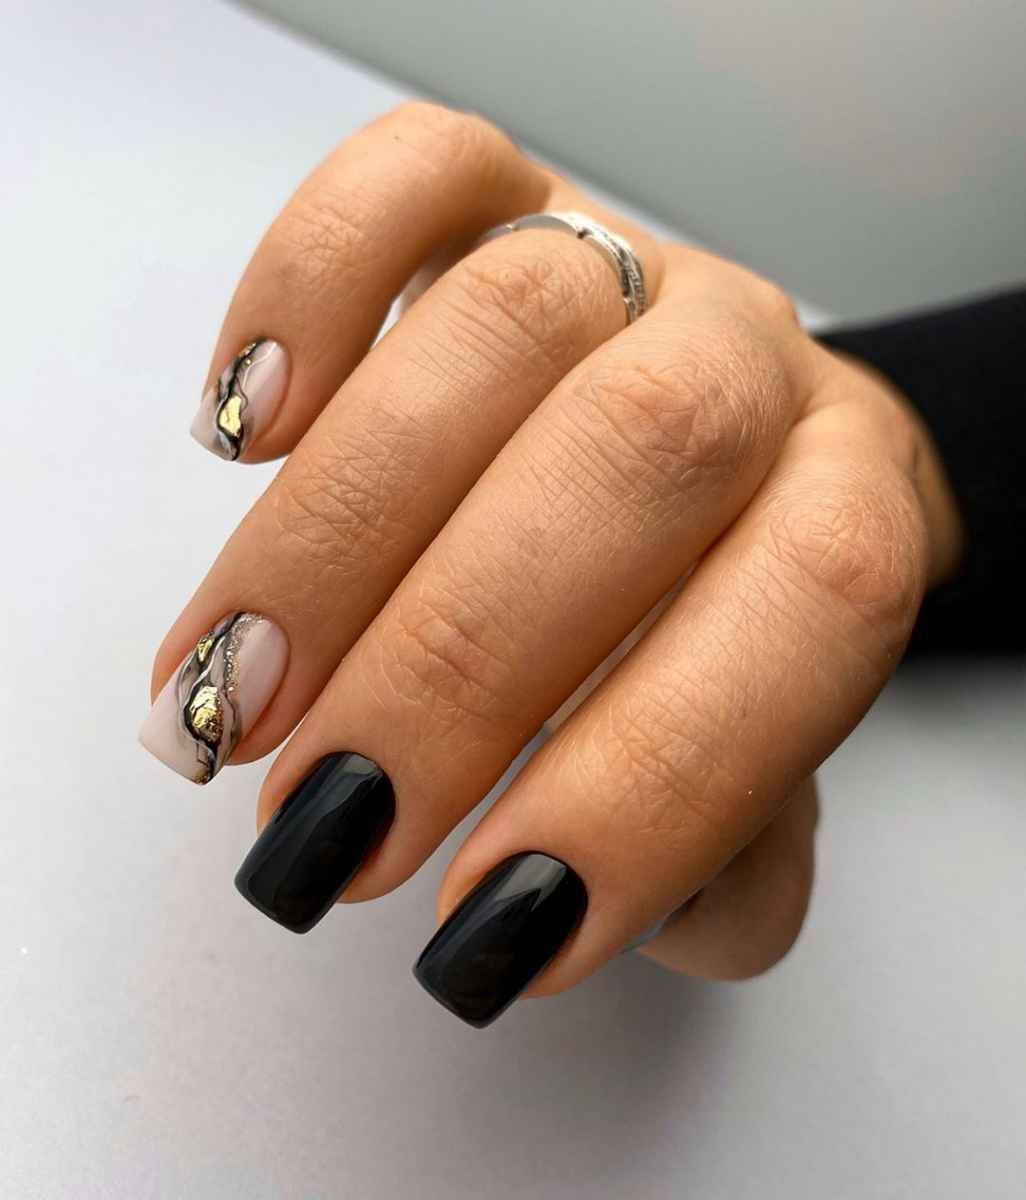 Фантазийные текстуры на ногтях фото_52